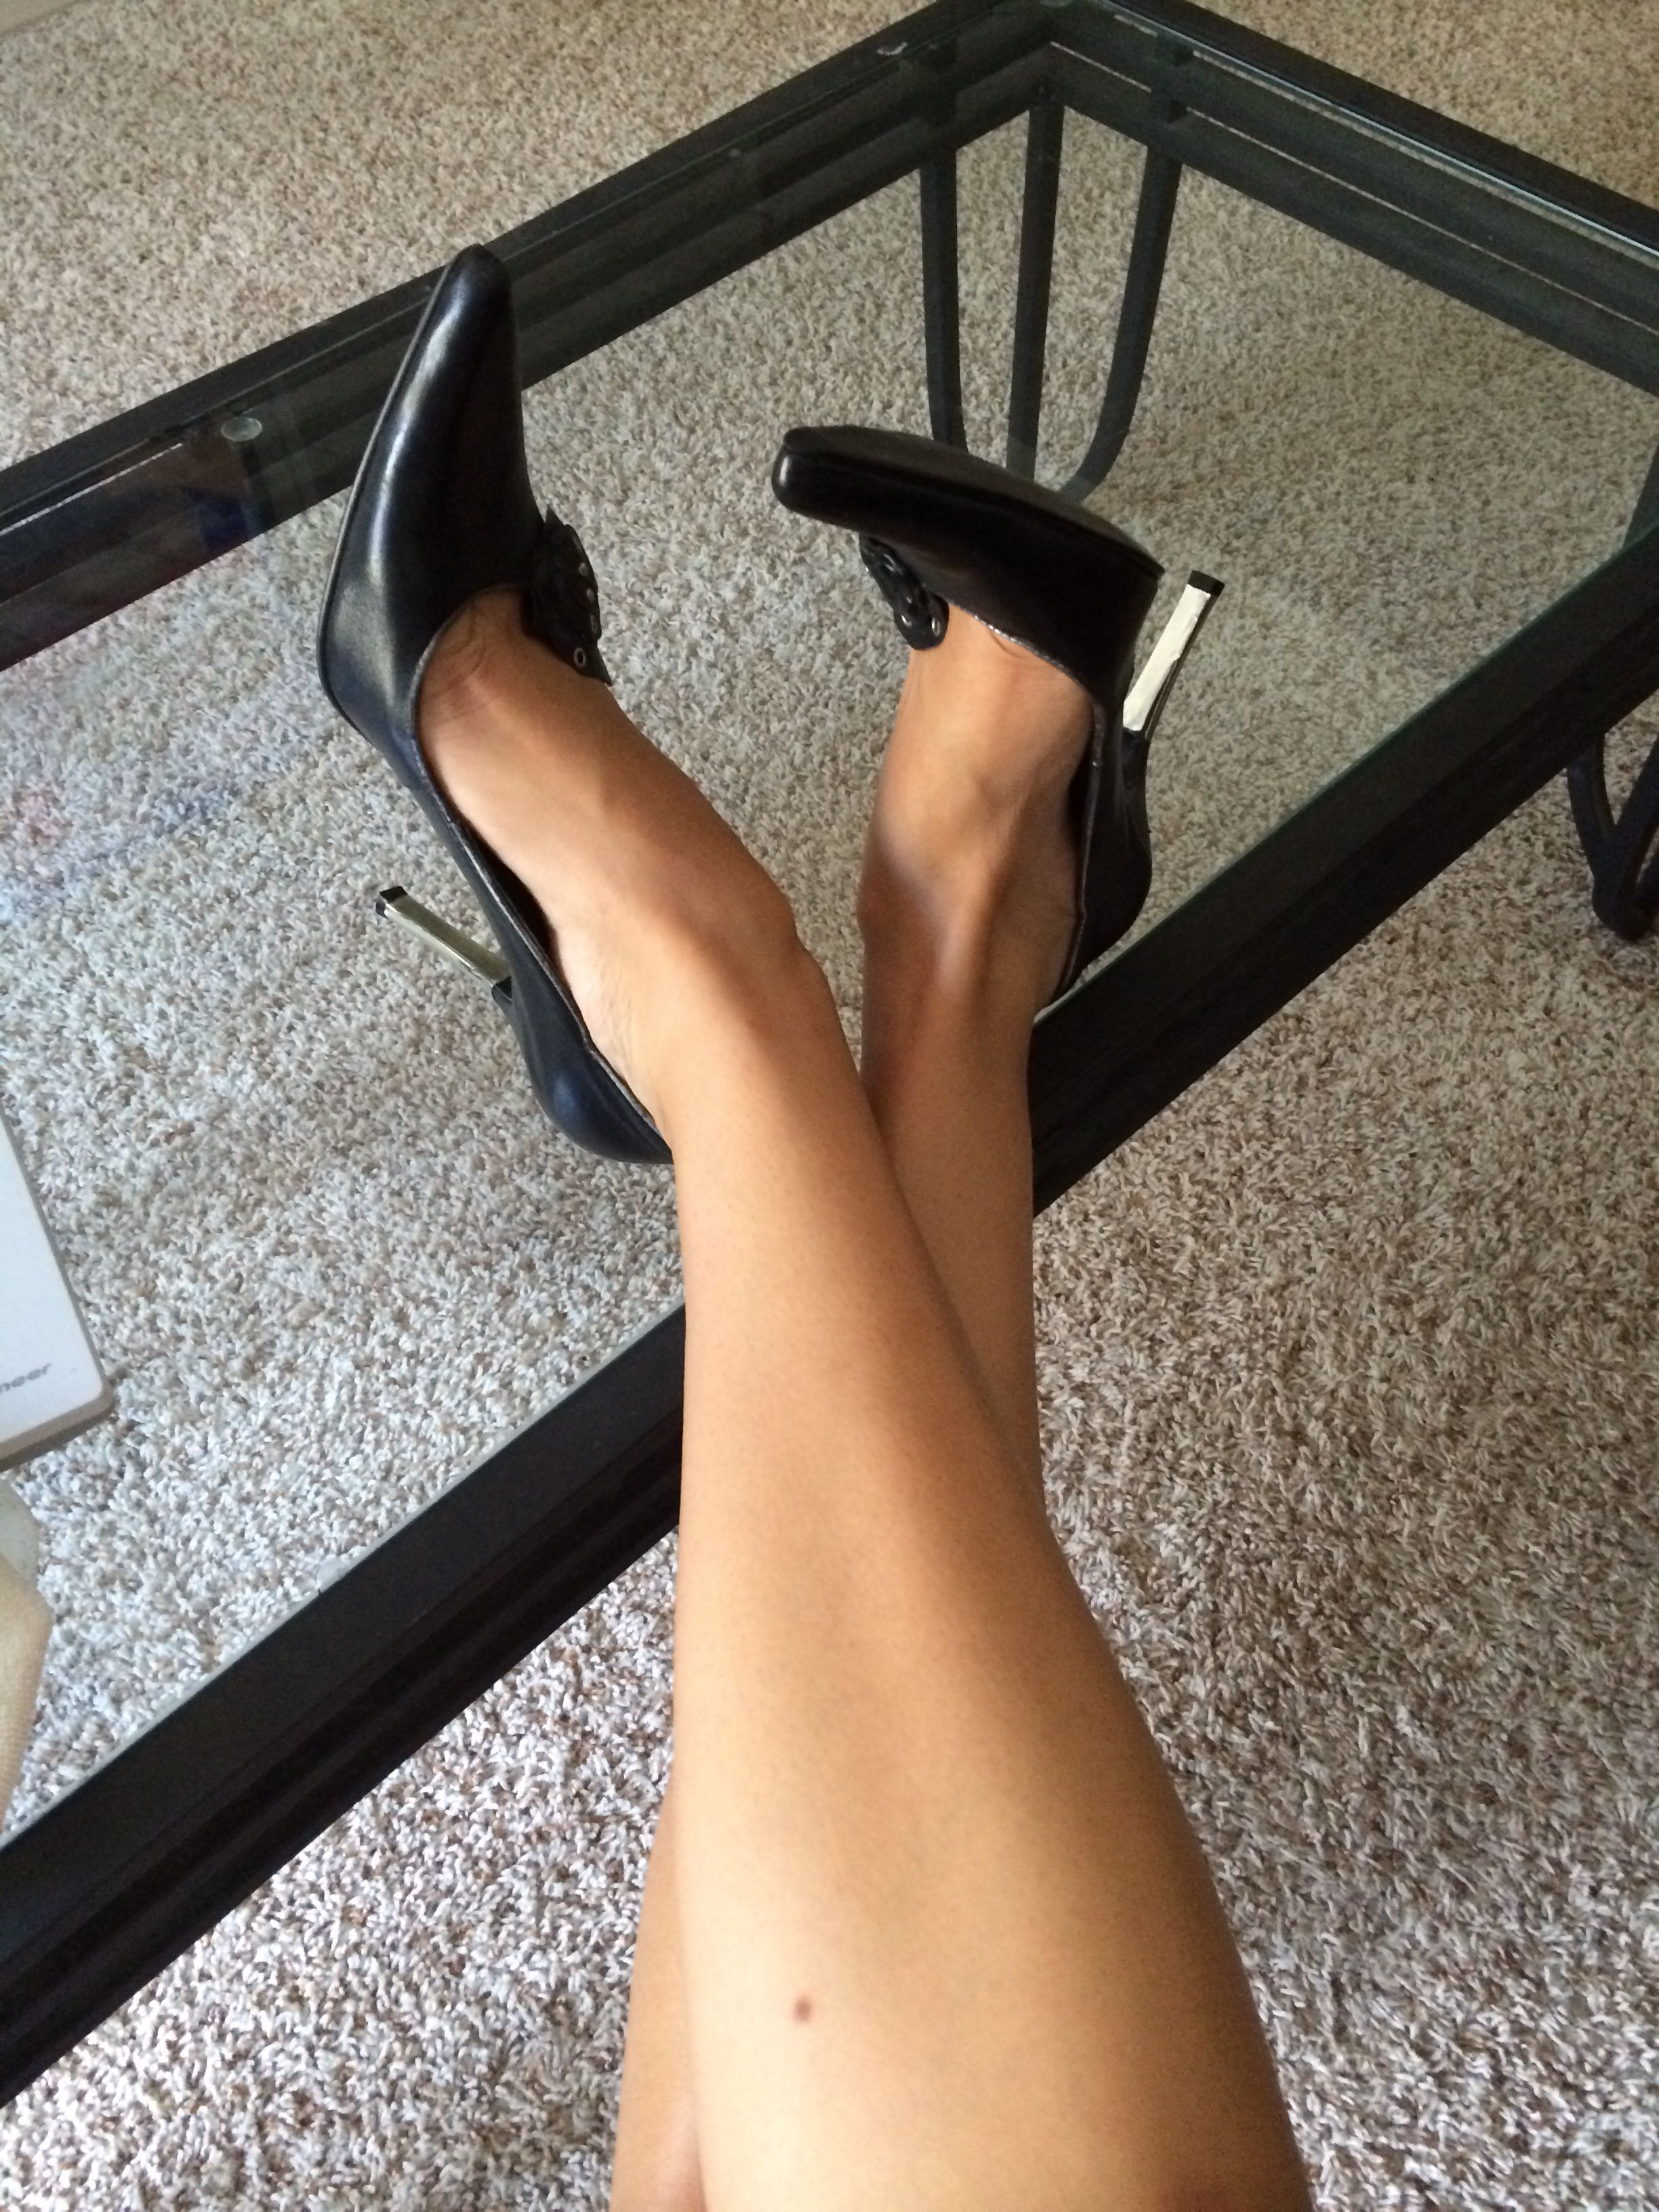 e23f3390478 Old school Steve Madden heels